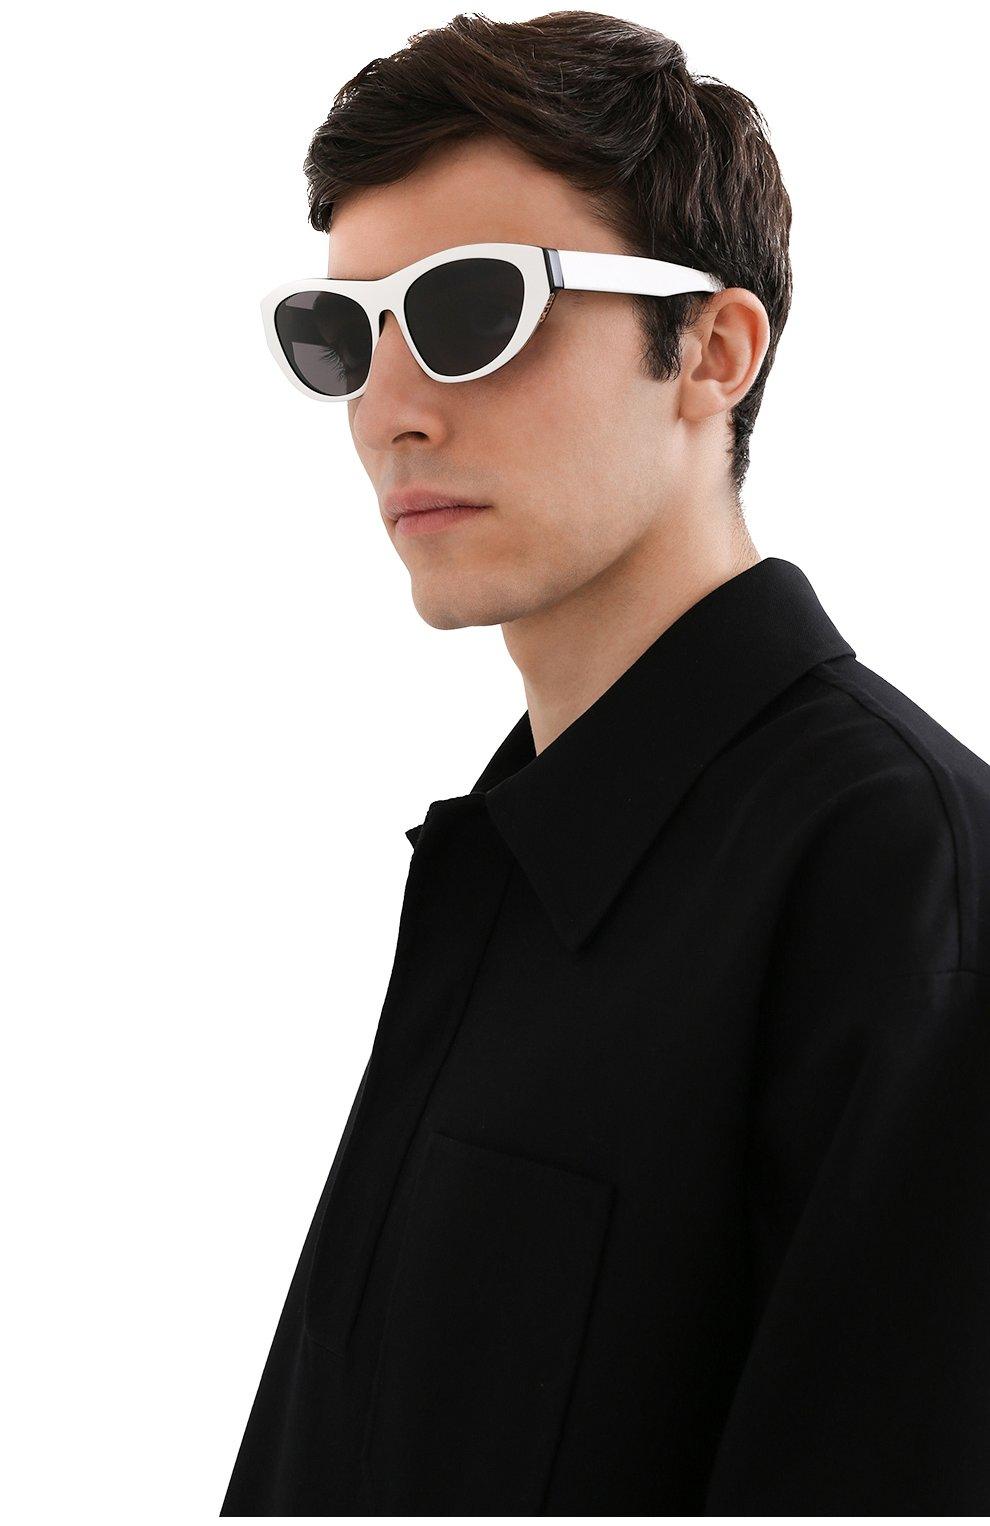 Женские солнцезащитные очки GCDS черно-белого цвета, арт. GD0010 21A | Фото 3 (Тип очков: С/з; Очки форма: Cat-eye; Оптика Гендер: оптика-унисекс)